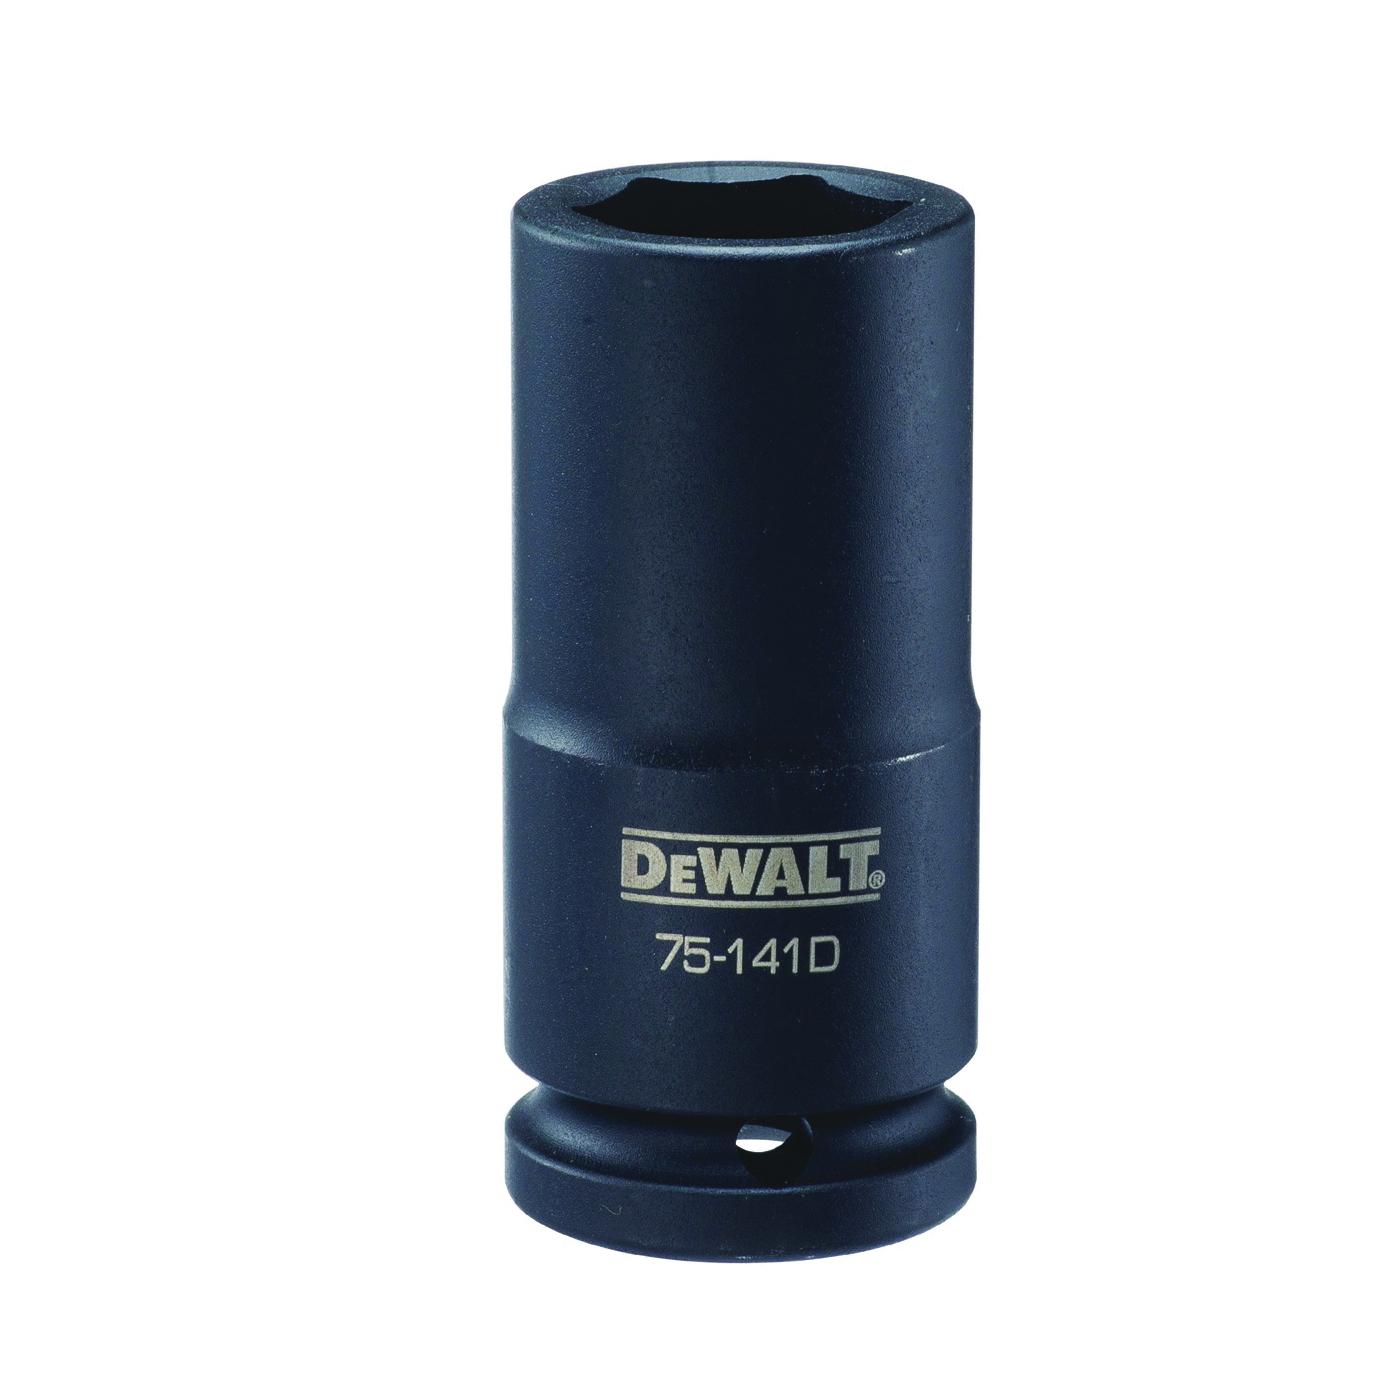 Picture of DeWALT DWMT75141OSP Impact Socket, 24 mm Socket, 3/4 in Drive, 6 -Point, CR-440 Steel, Black Oxide